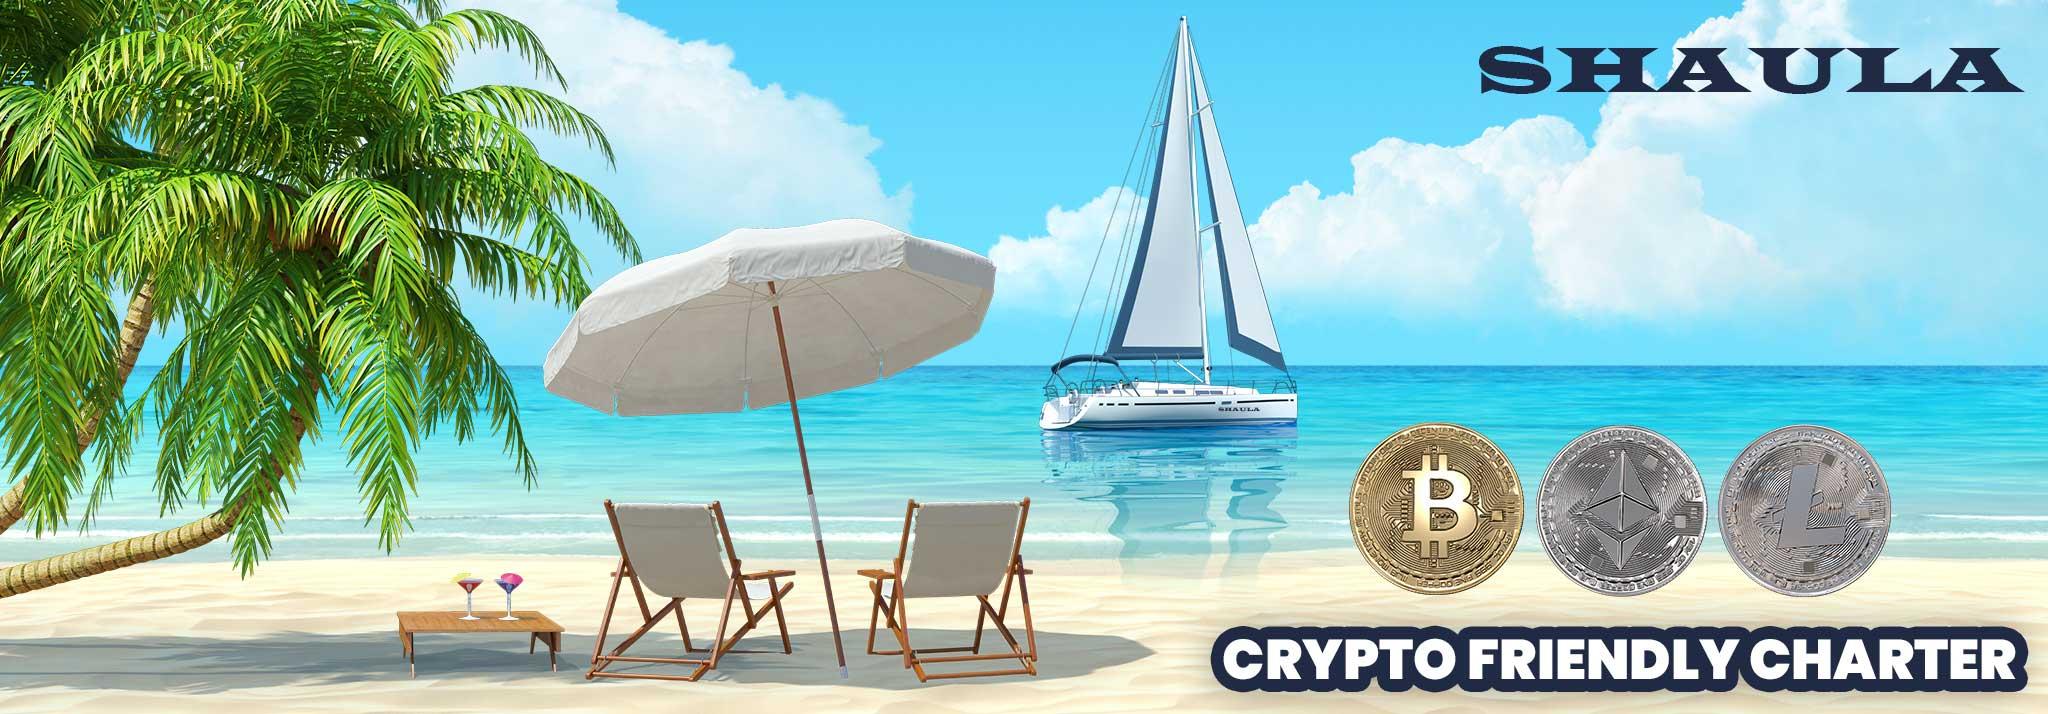 Crypto Friendly Charter San Blas